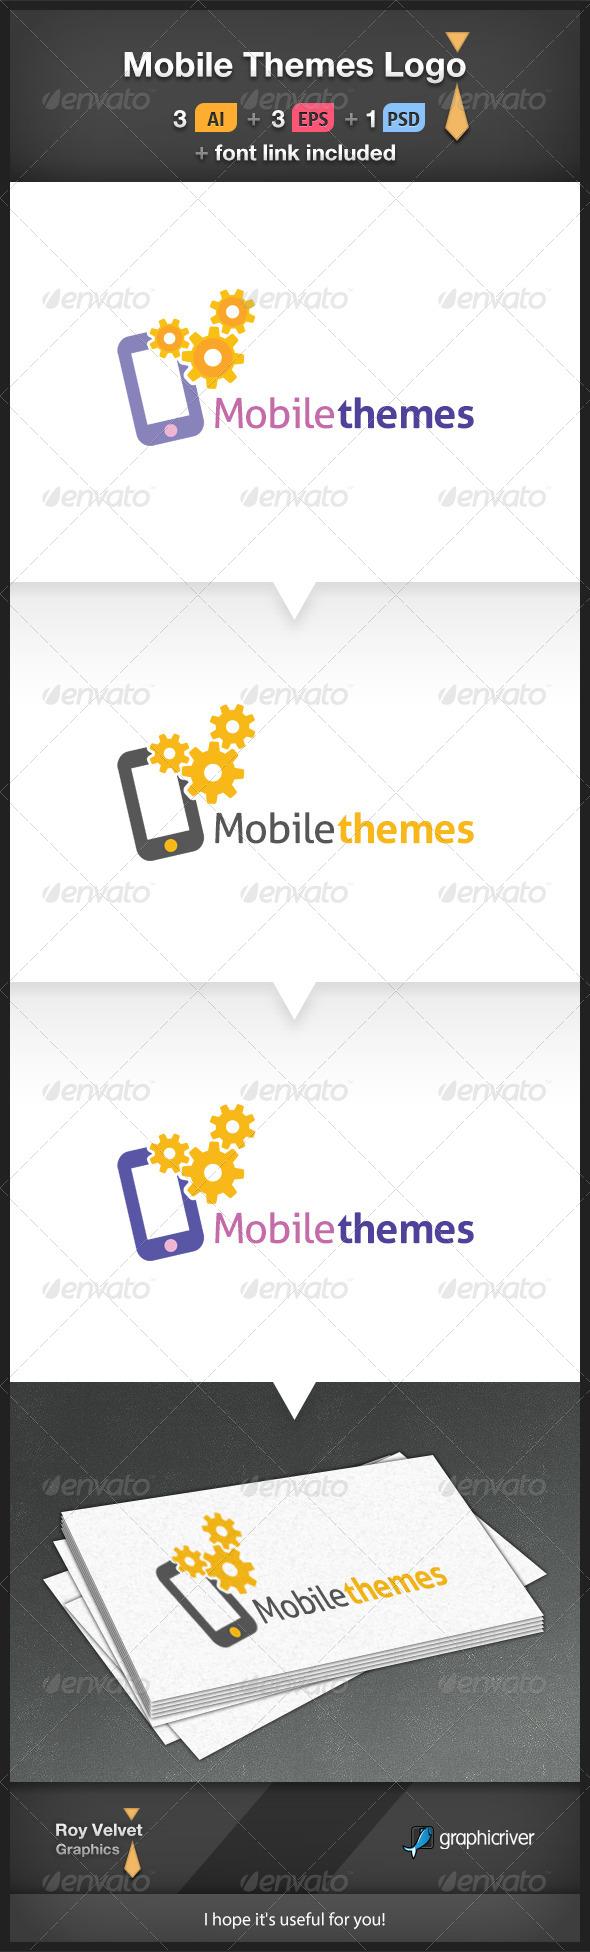 Mobile Themes Logo - Symbols Logo Templates